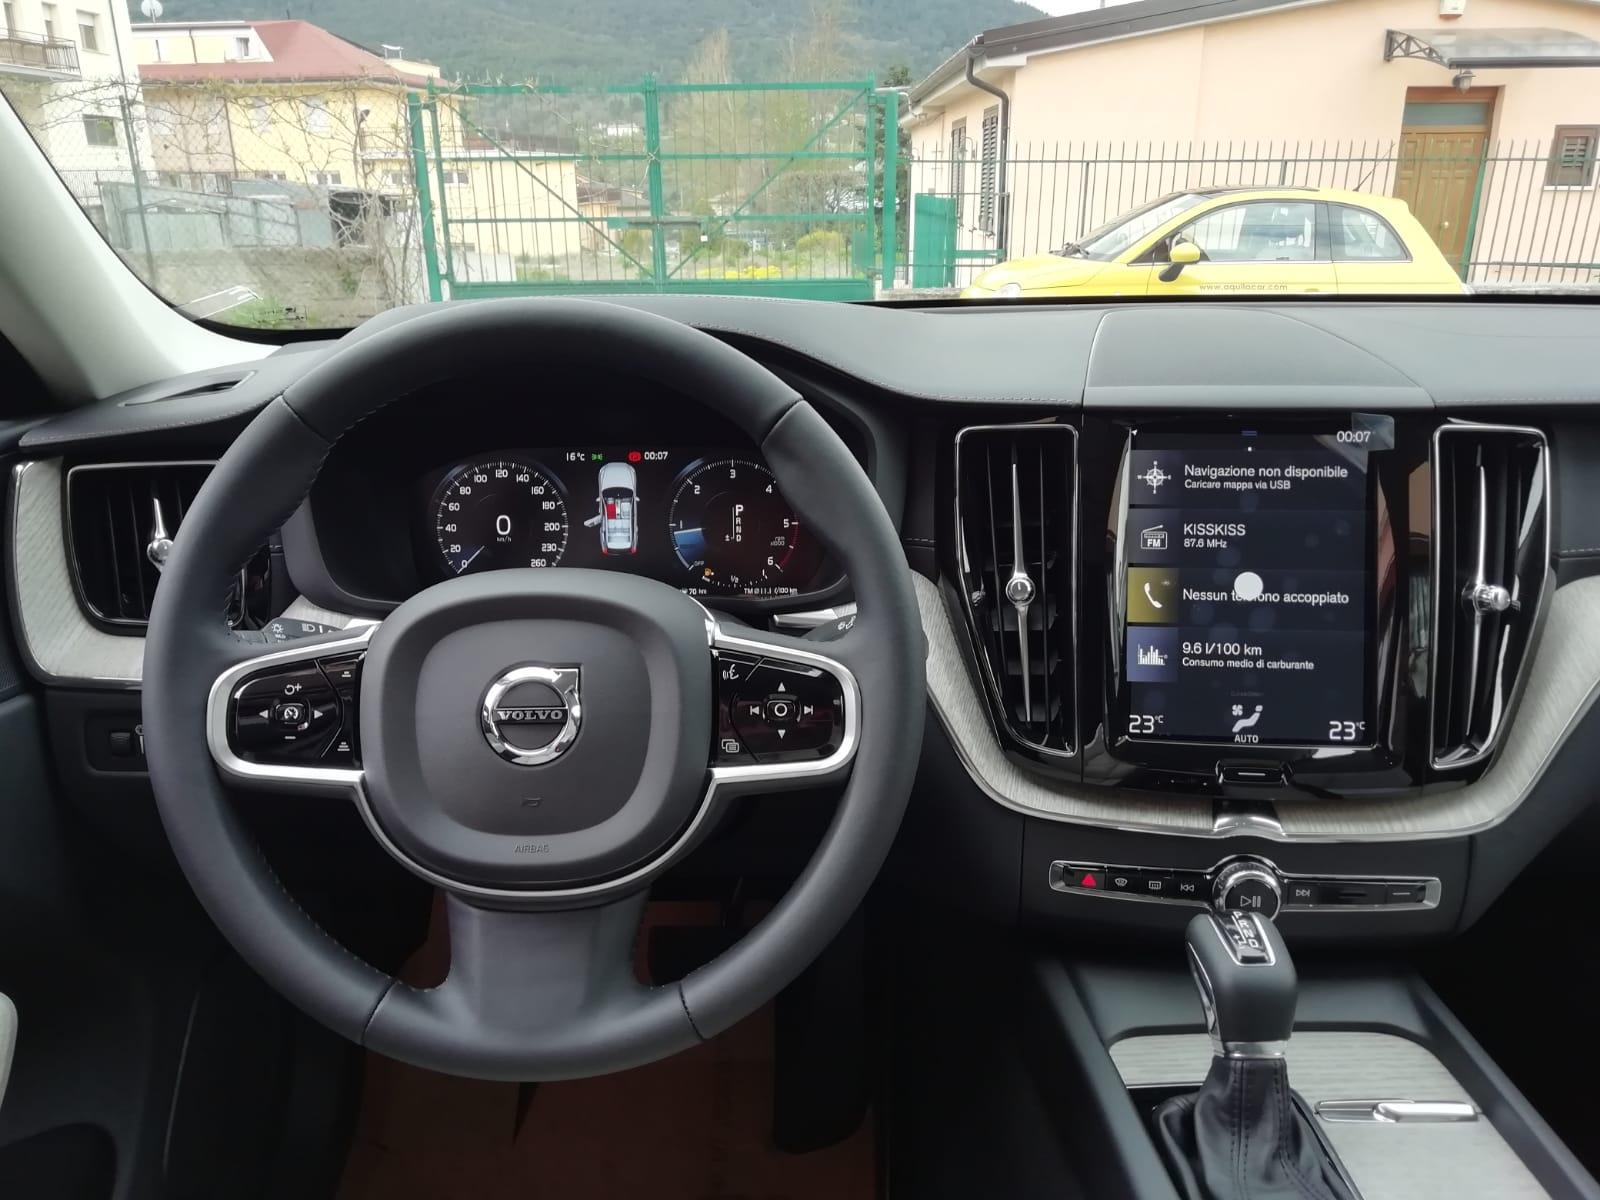 VOLVO XC60 D4 INSCRIPTION AUTOM. 190 cv